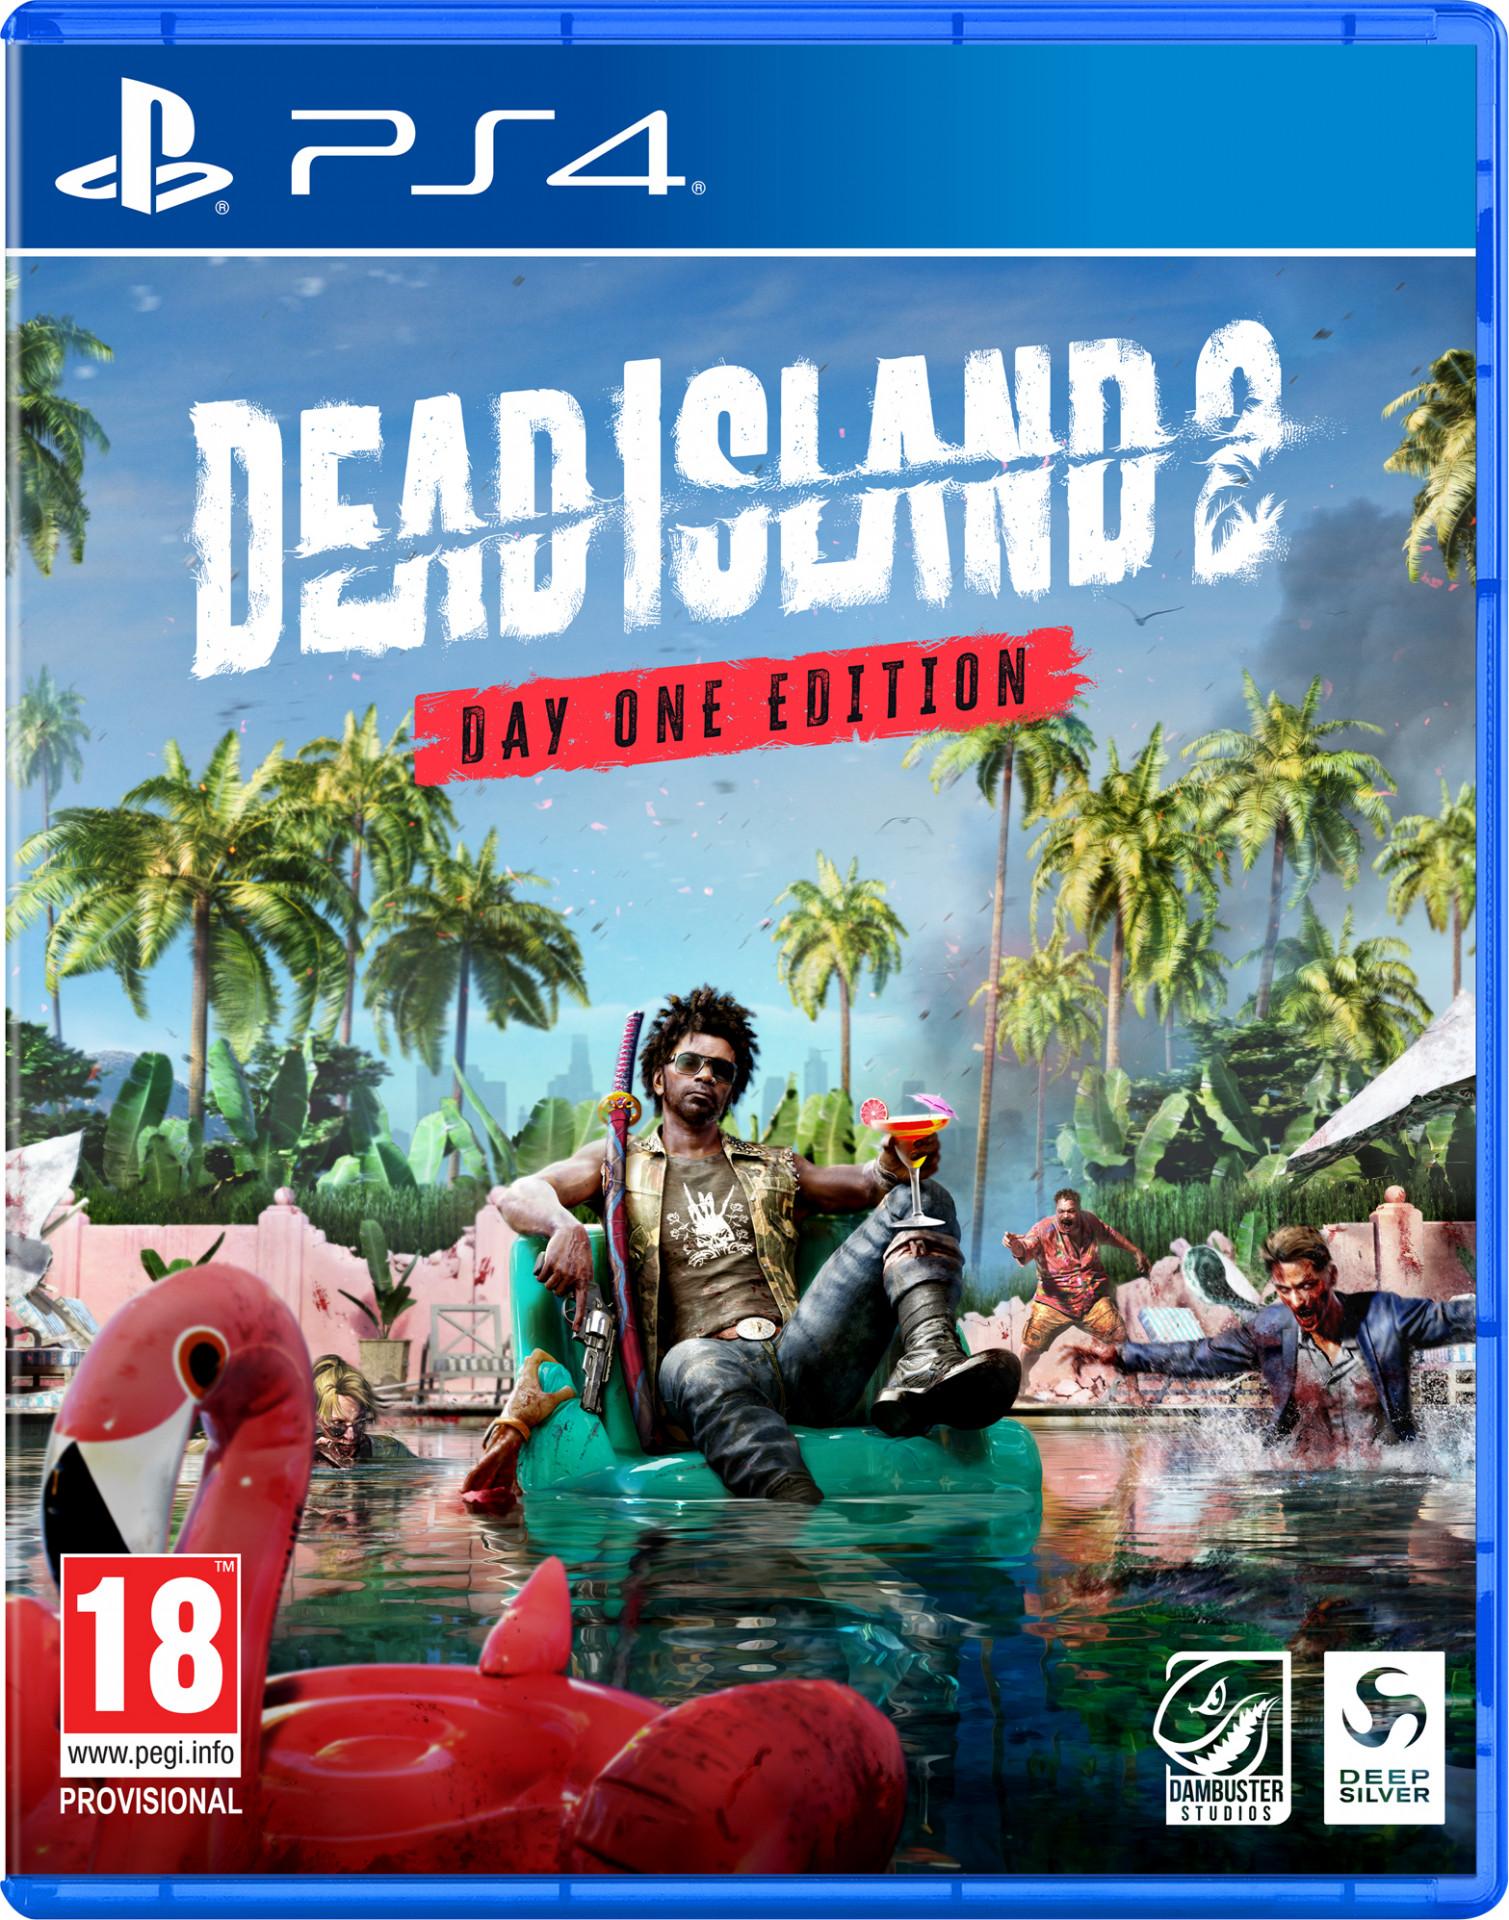 Dead Island 2, Playstation 4